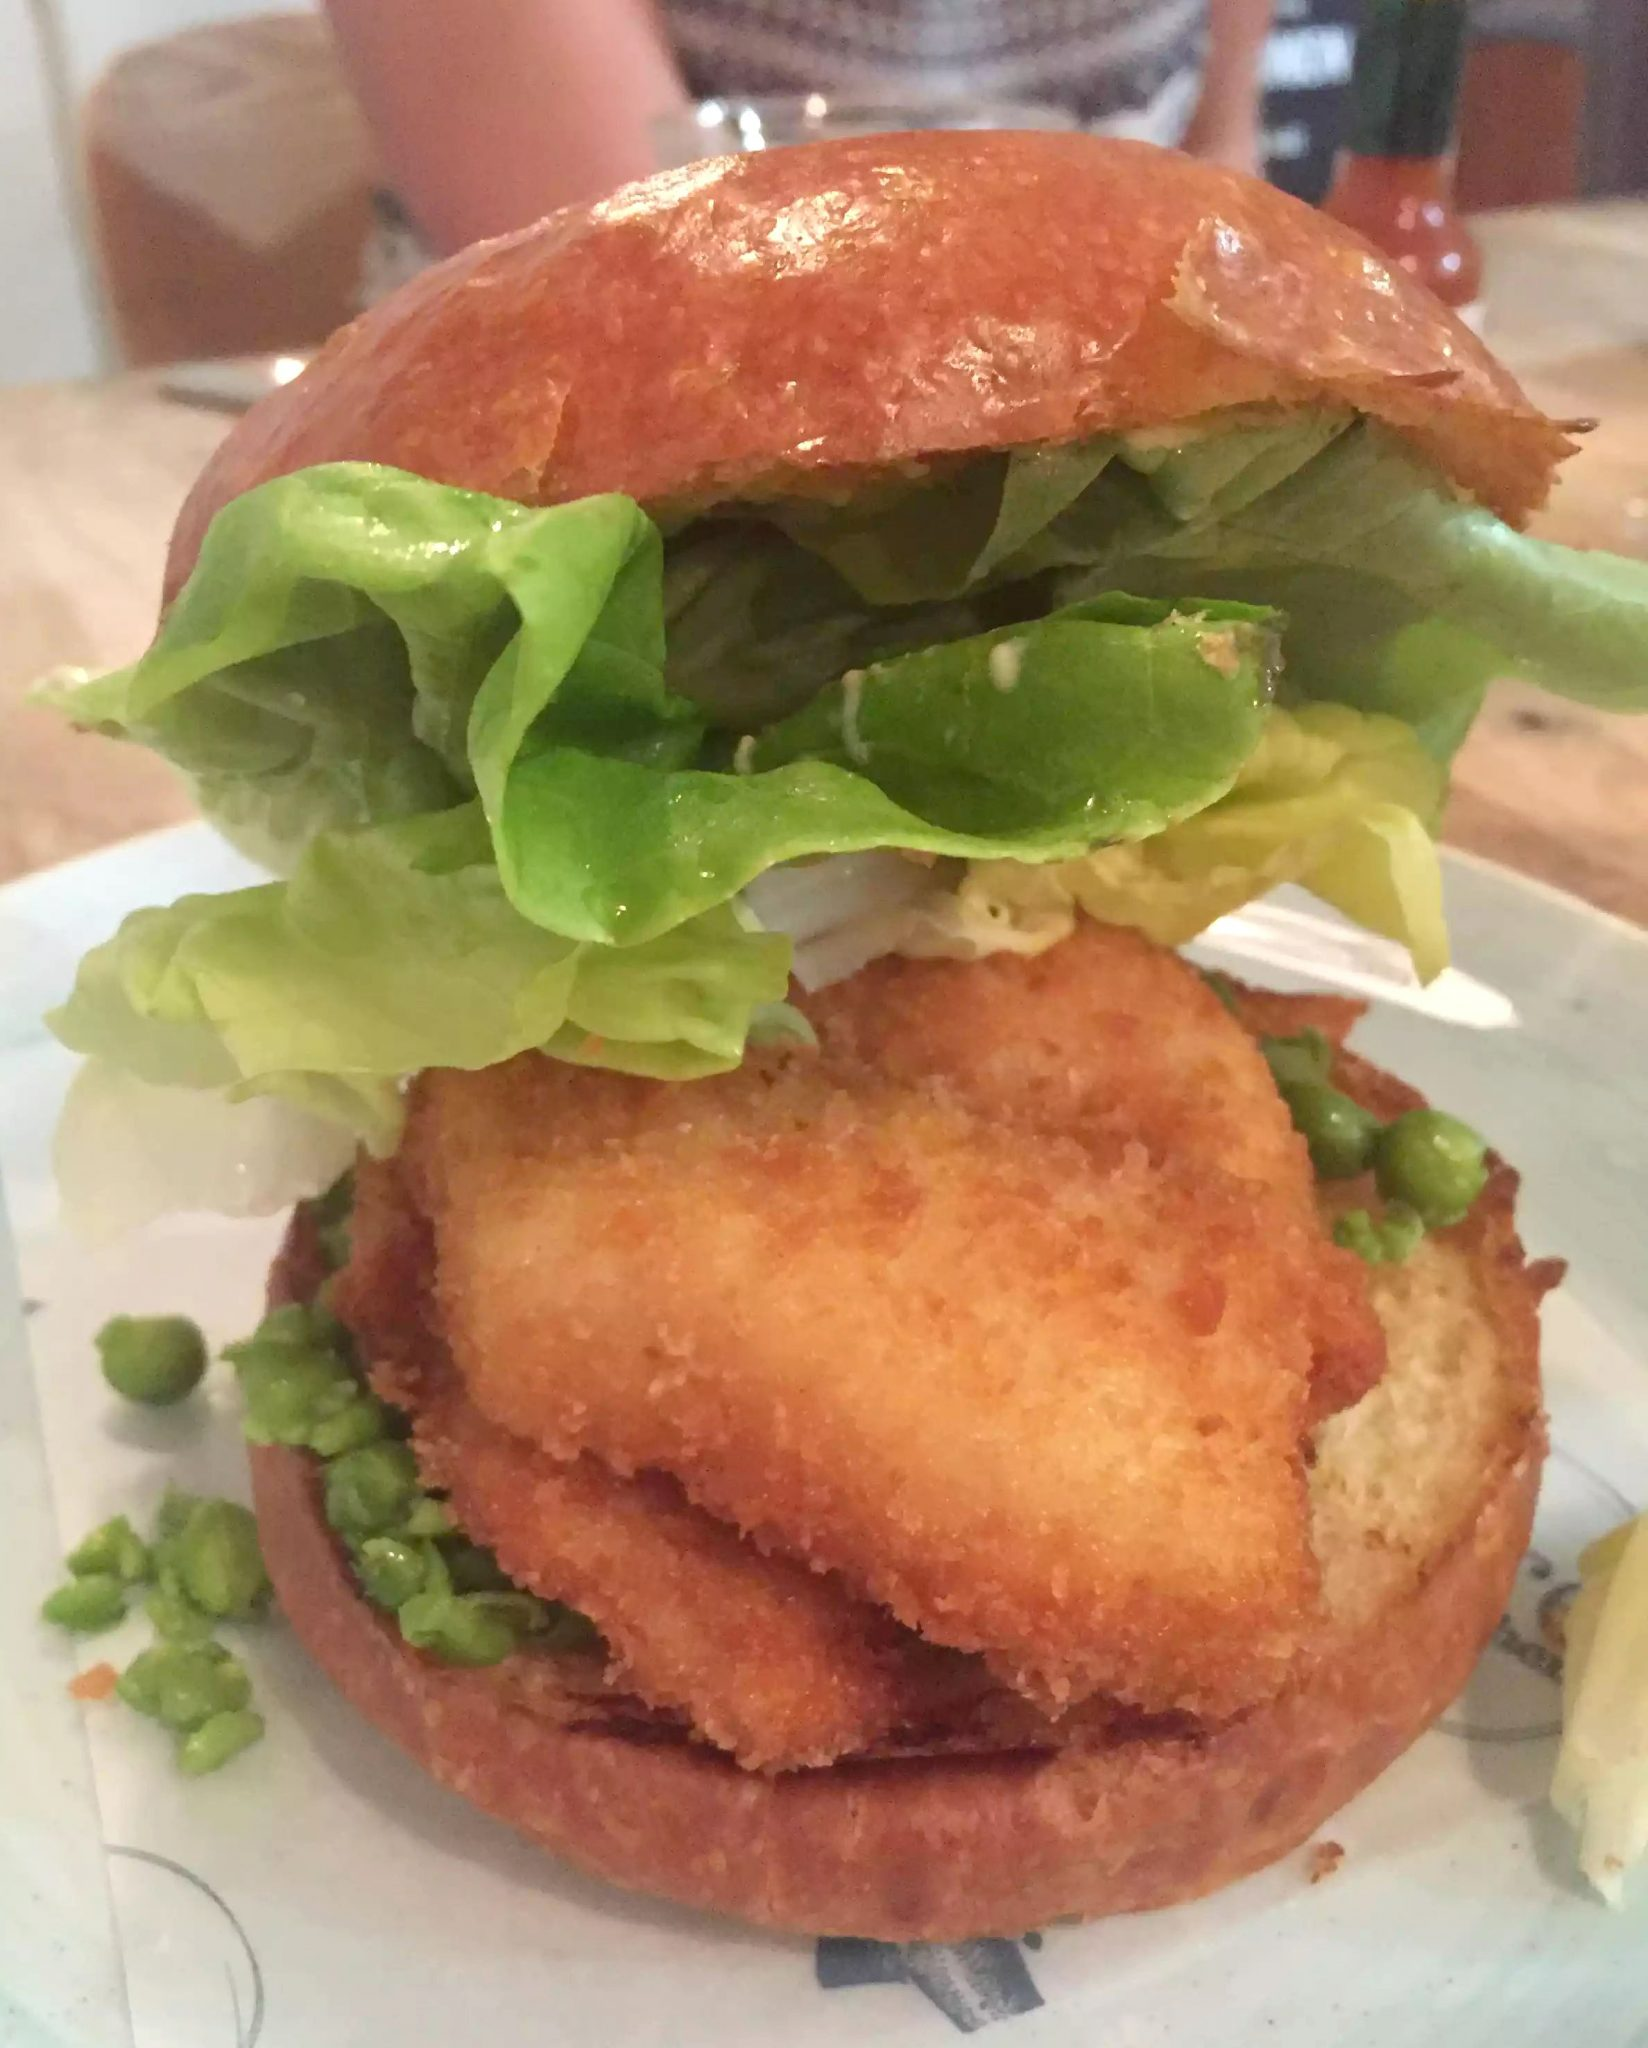 Lure Fish Kitchen North London Kentish Town Seafood Restaurant Seadog Breaded Cod Burger